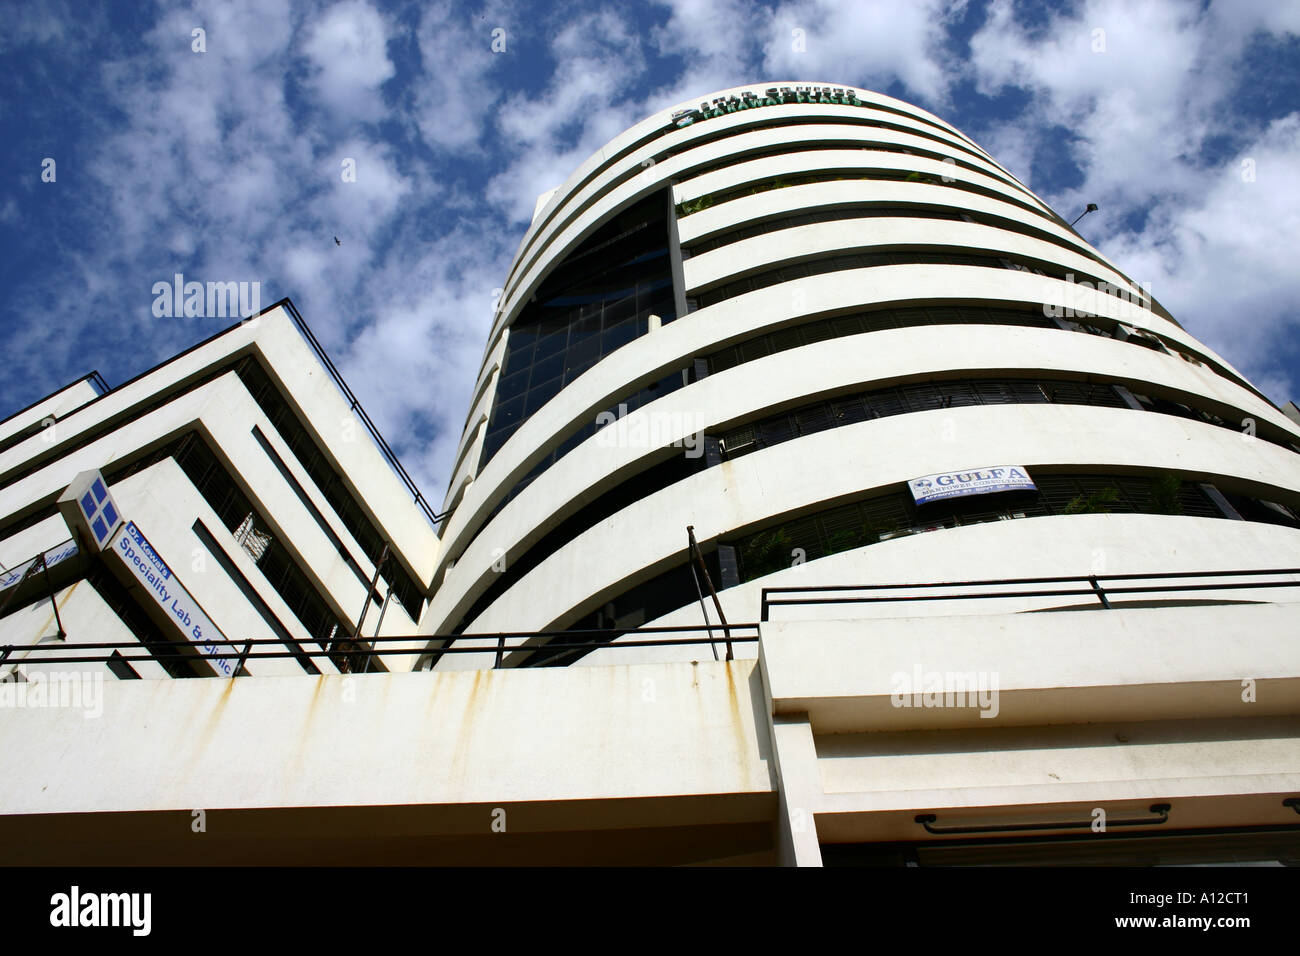 RSC75077 moderne indische Architektur Gebäude Andheri Mumbai Maharashtra Westindien Stockbild